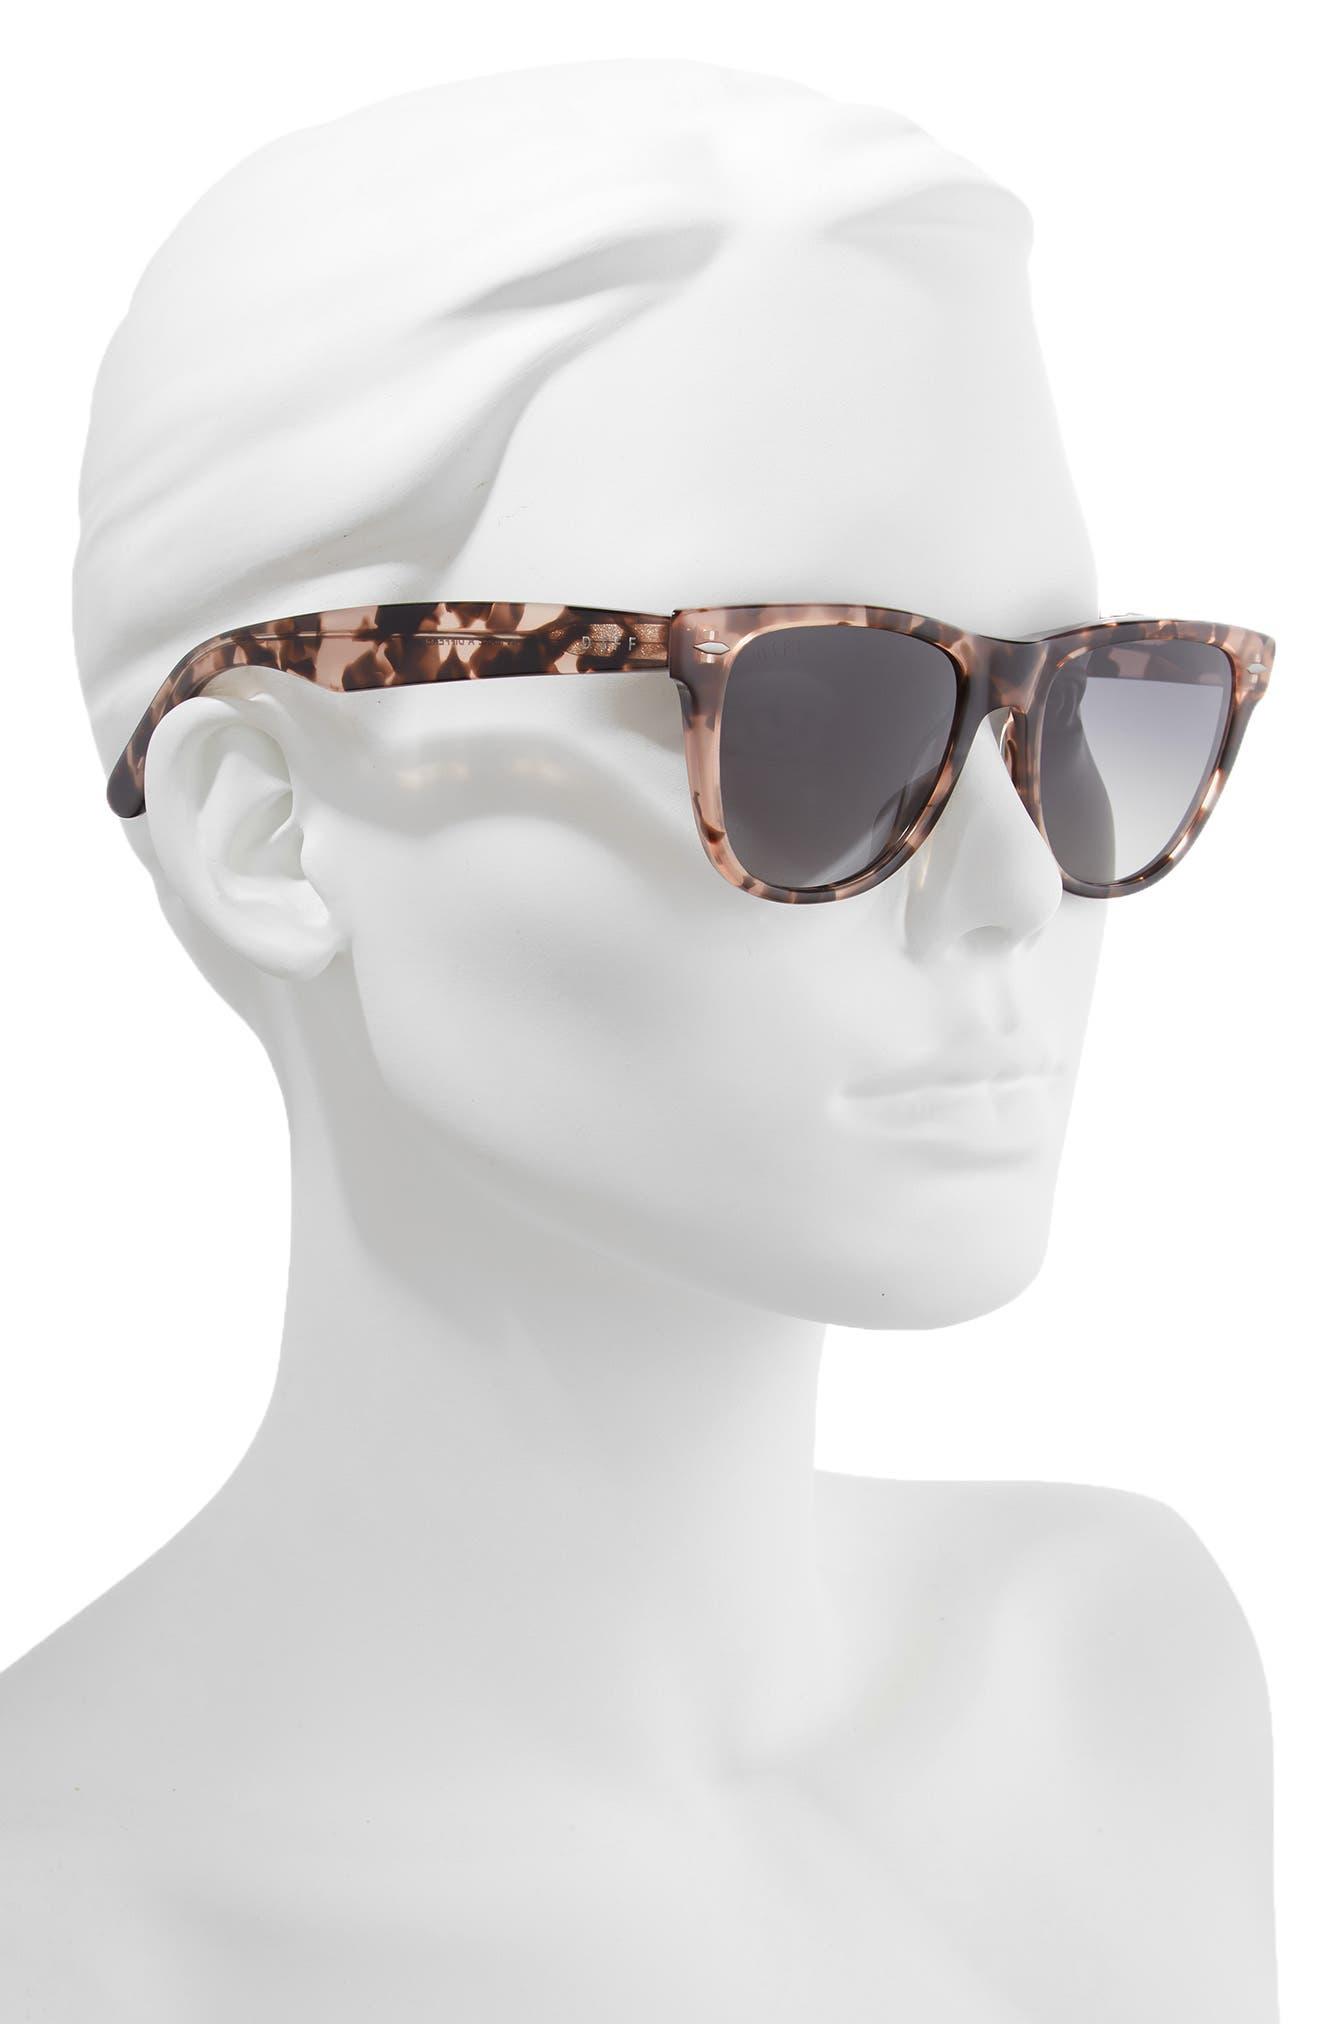 Kota 51mm Gradient Polarized Cat Eye Sunglasses,                             Alternate thumbnail 2, color,                             HIMALYAN/ GREY